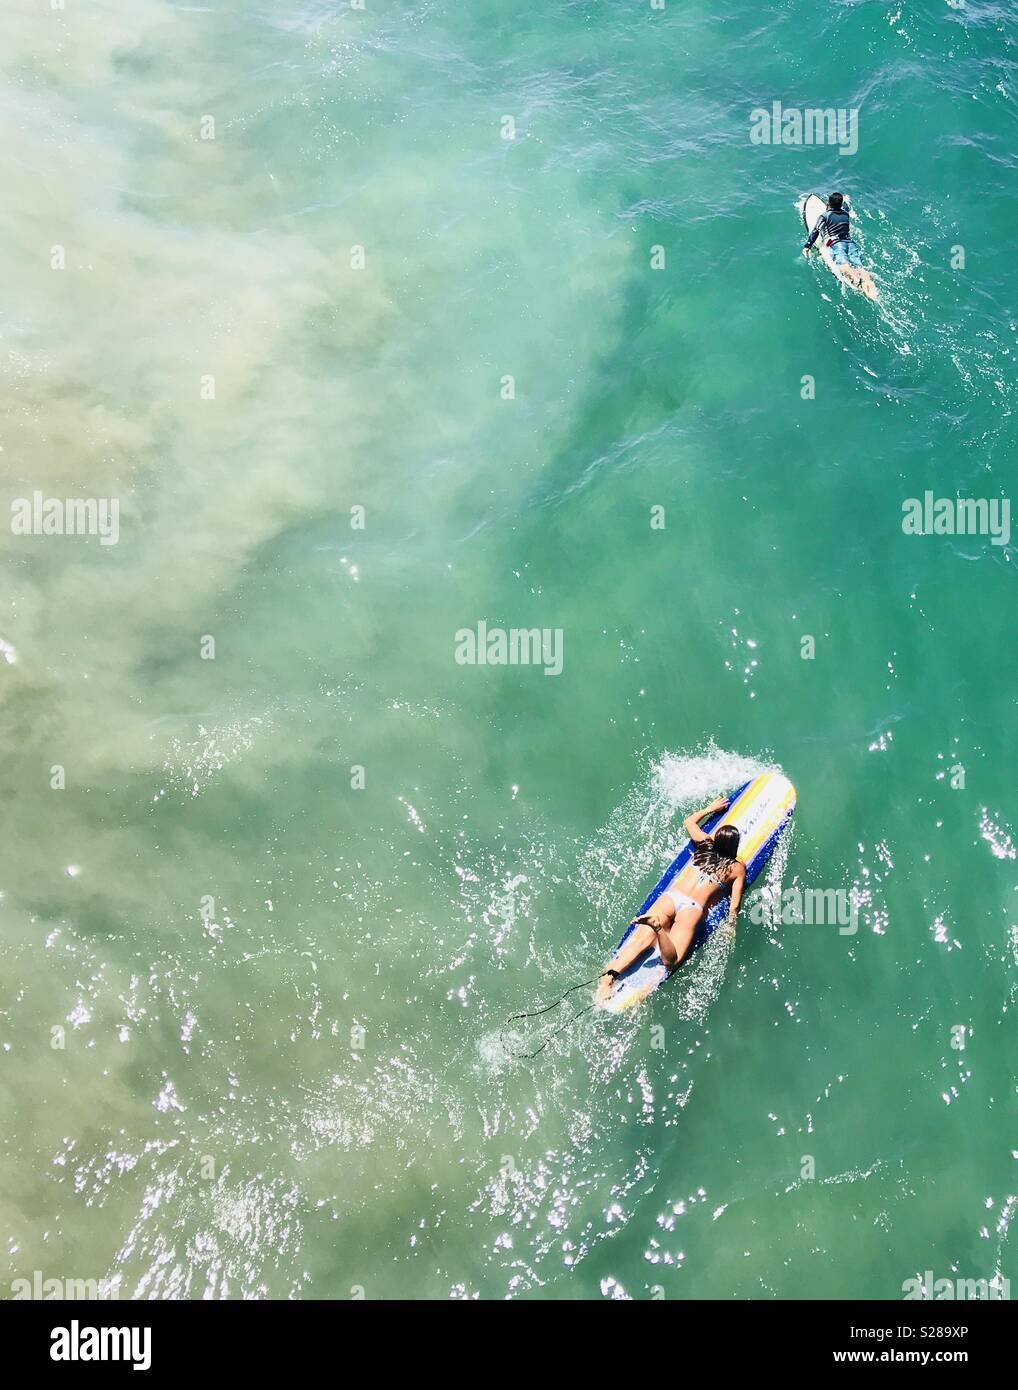 Surfer Paddeln, Surfen. Manhattan Beach, Kalifornien, USA. Stockbild